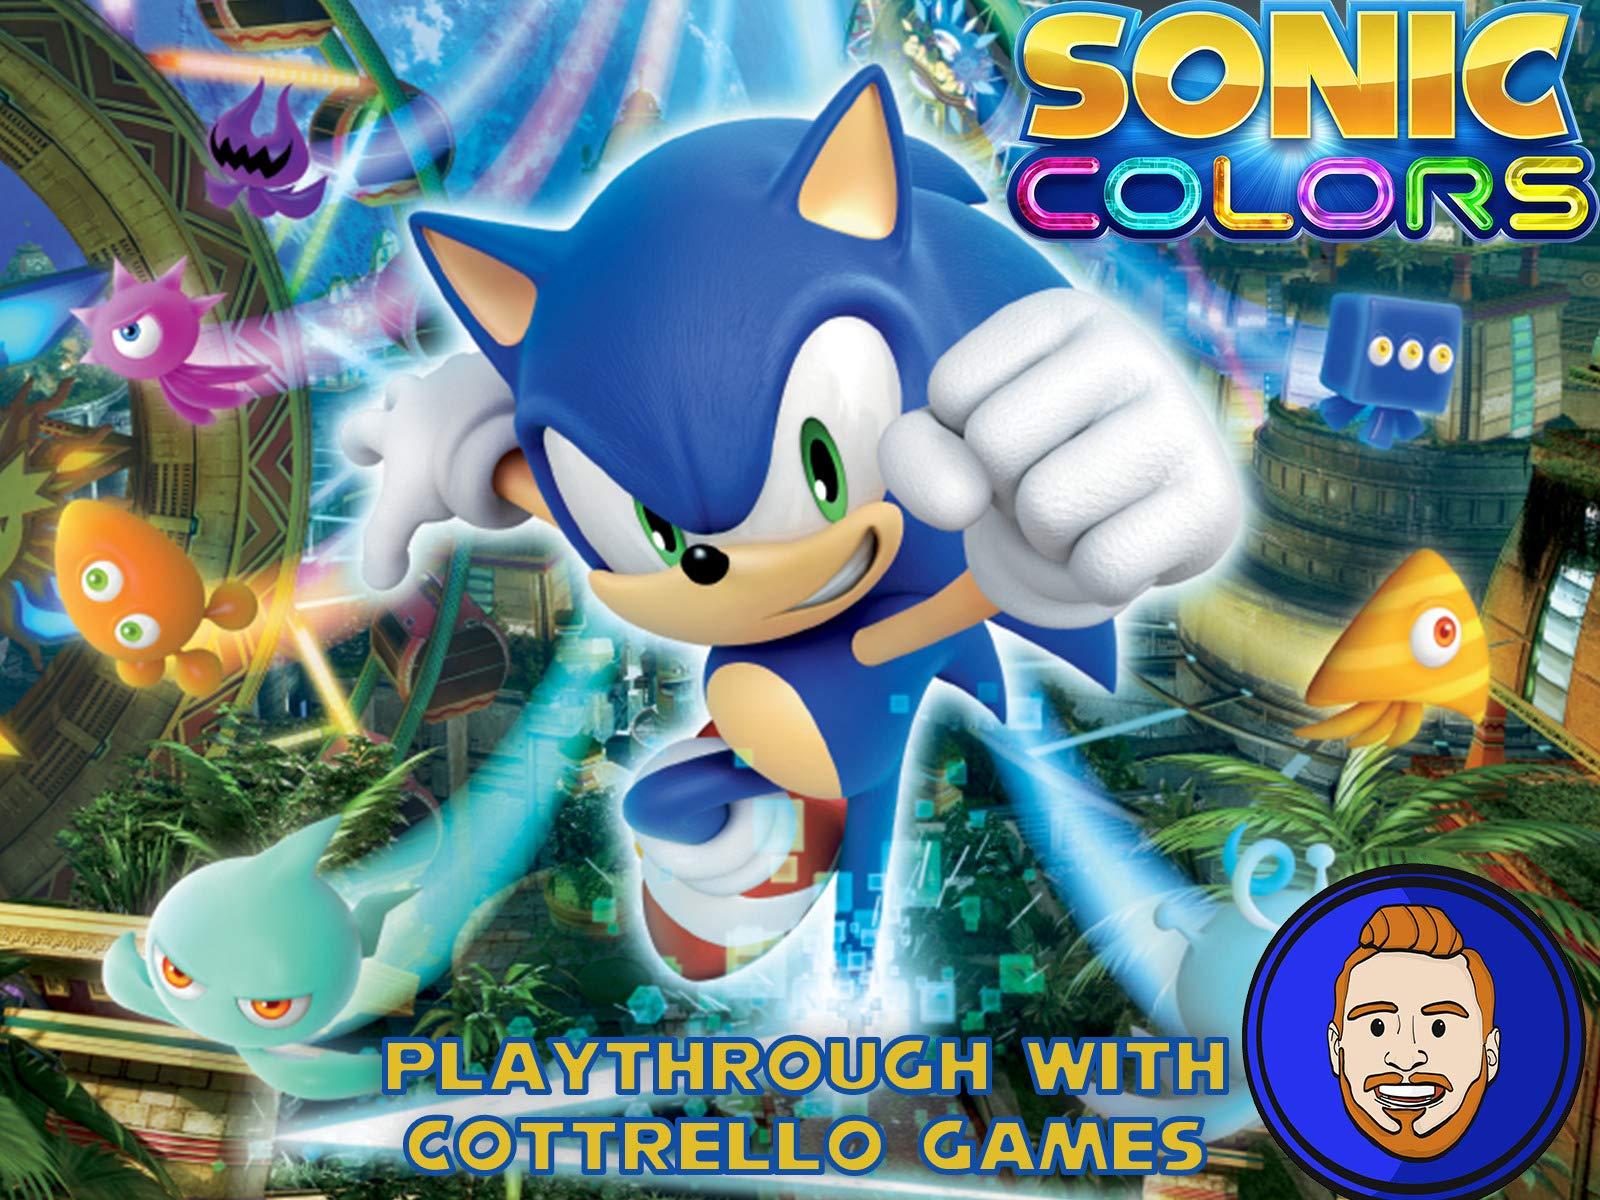 Watch Sonic Colors Playthrough With Cottrello Games On Amazon Prime Video Uk Newonamzprimeuk